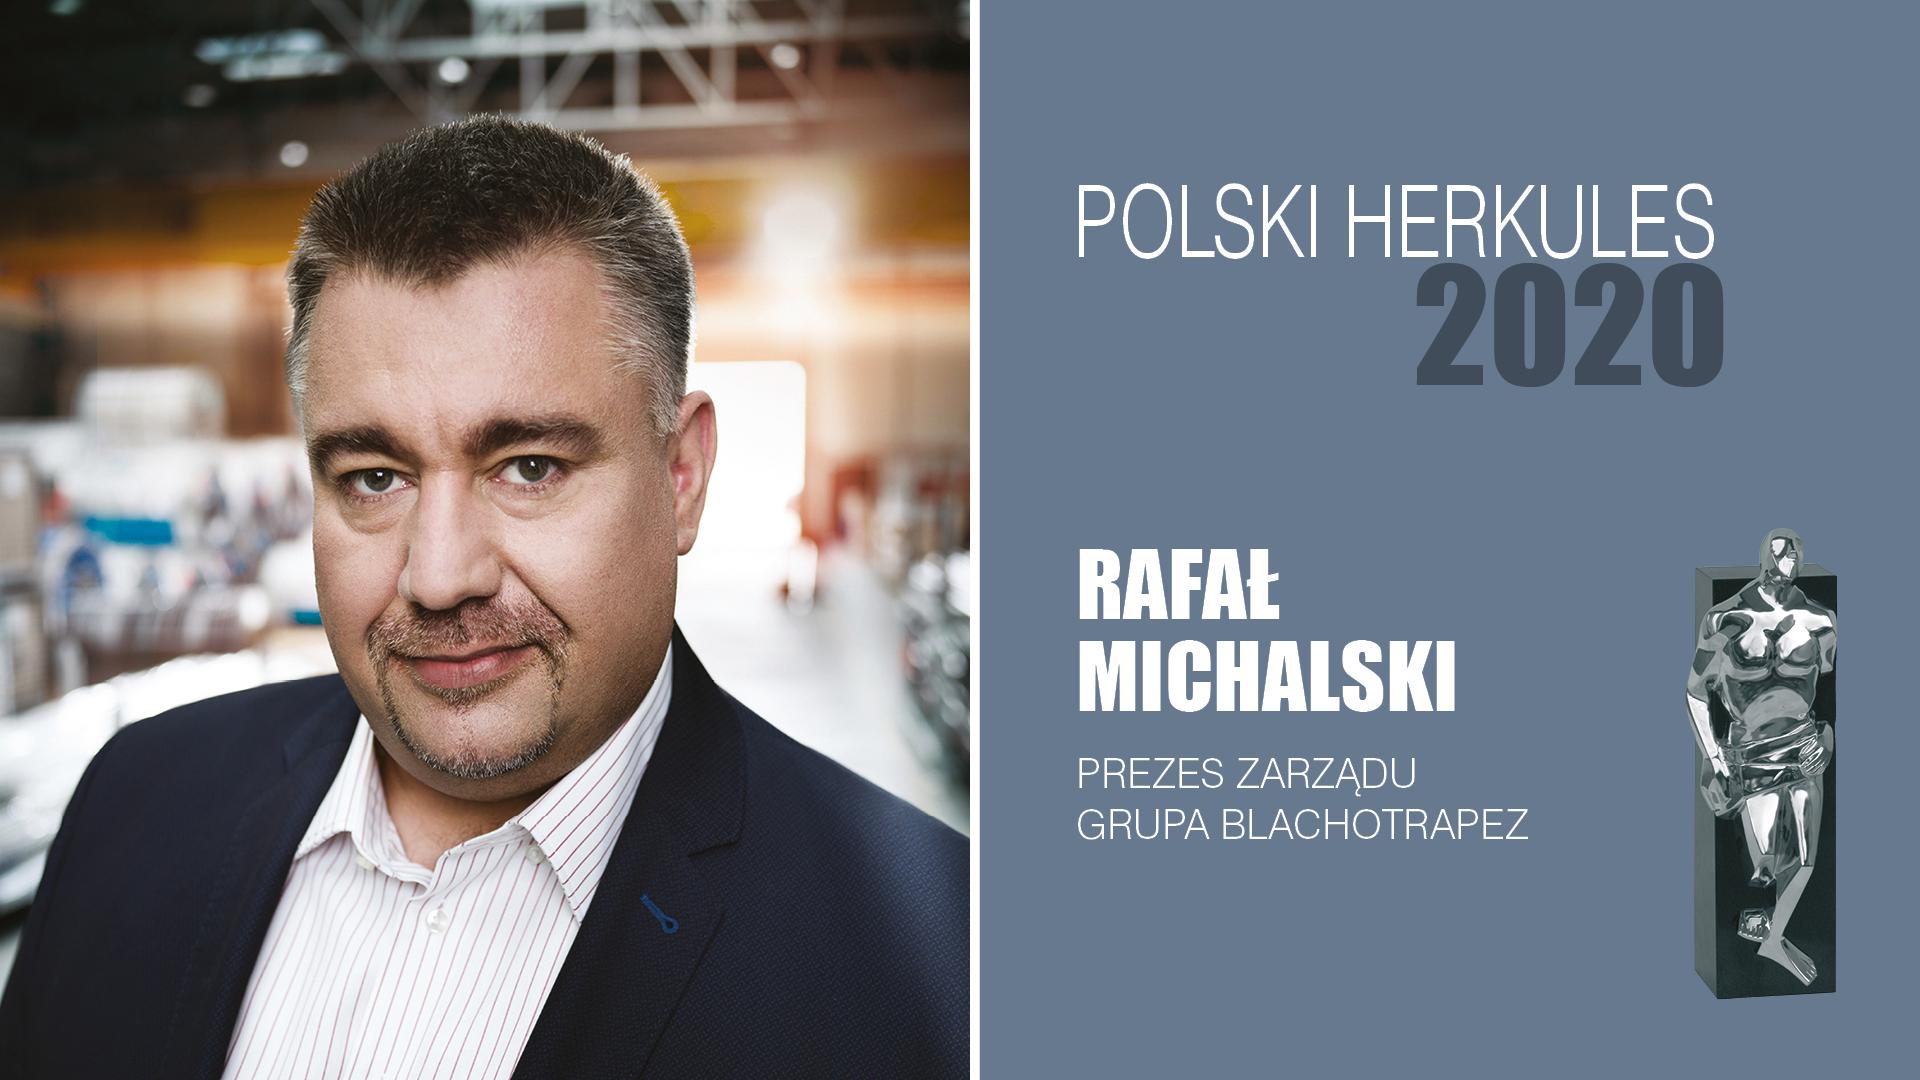 RAFAŁ MICHALSKI – Polski Herkules 2020